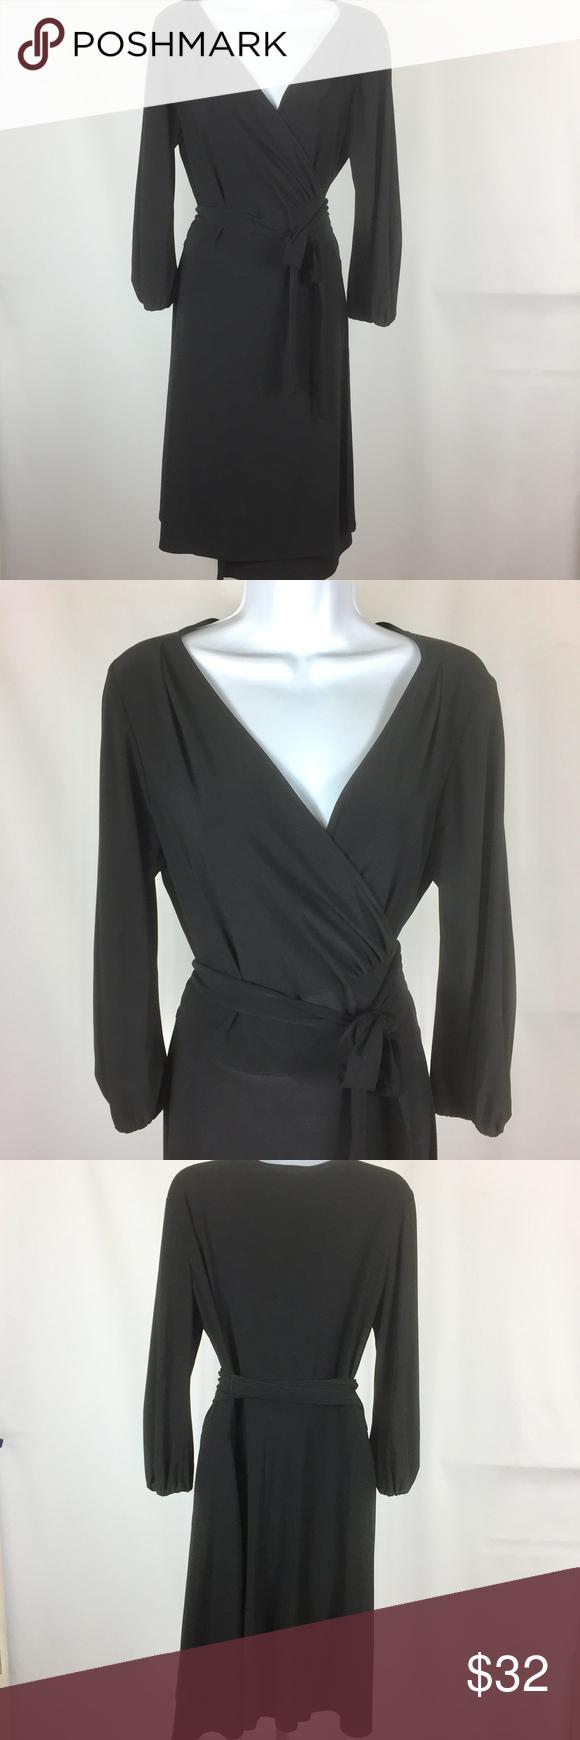 Jones new york wrap dress black size p bust measurement is